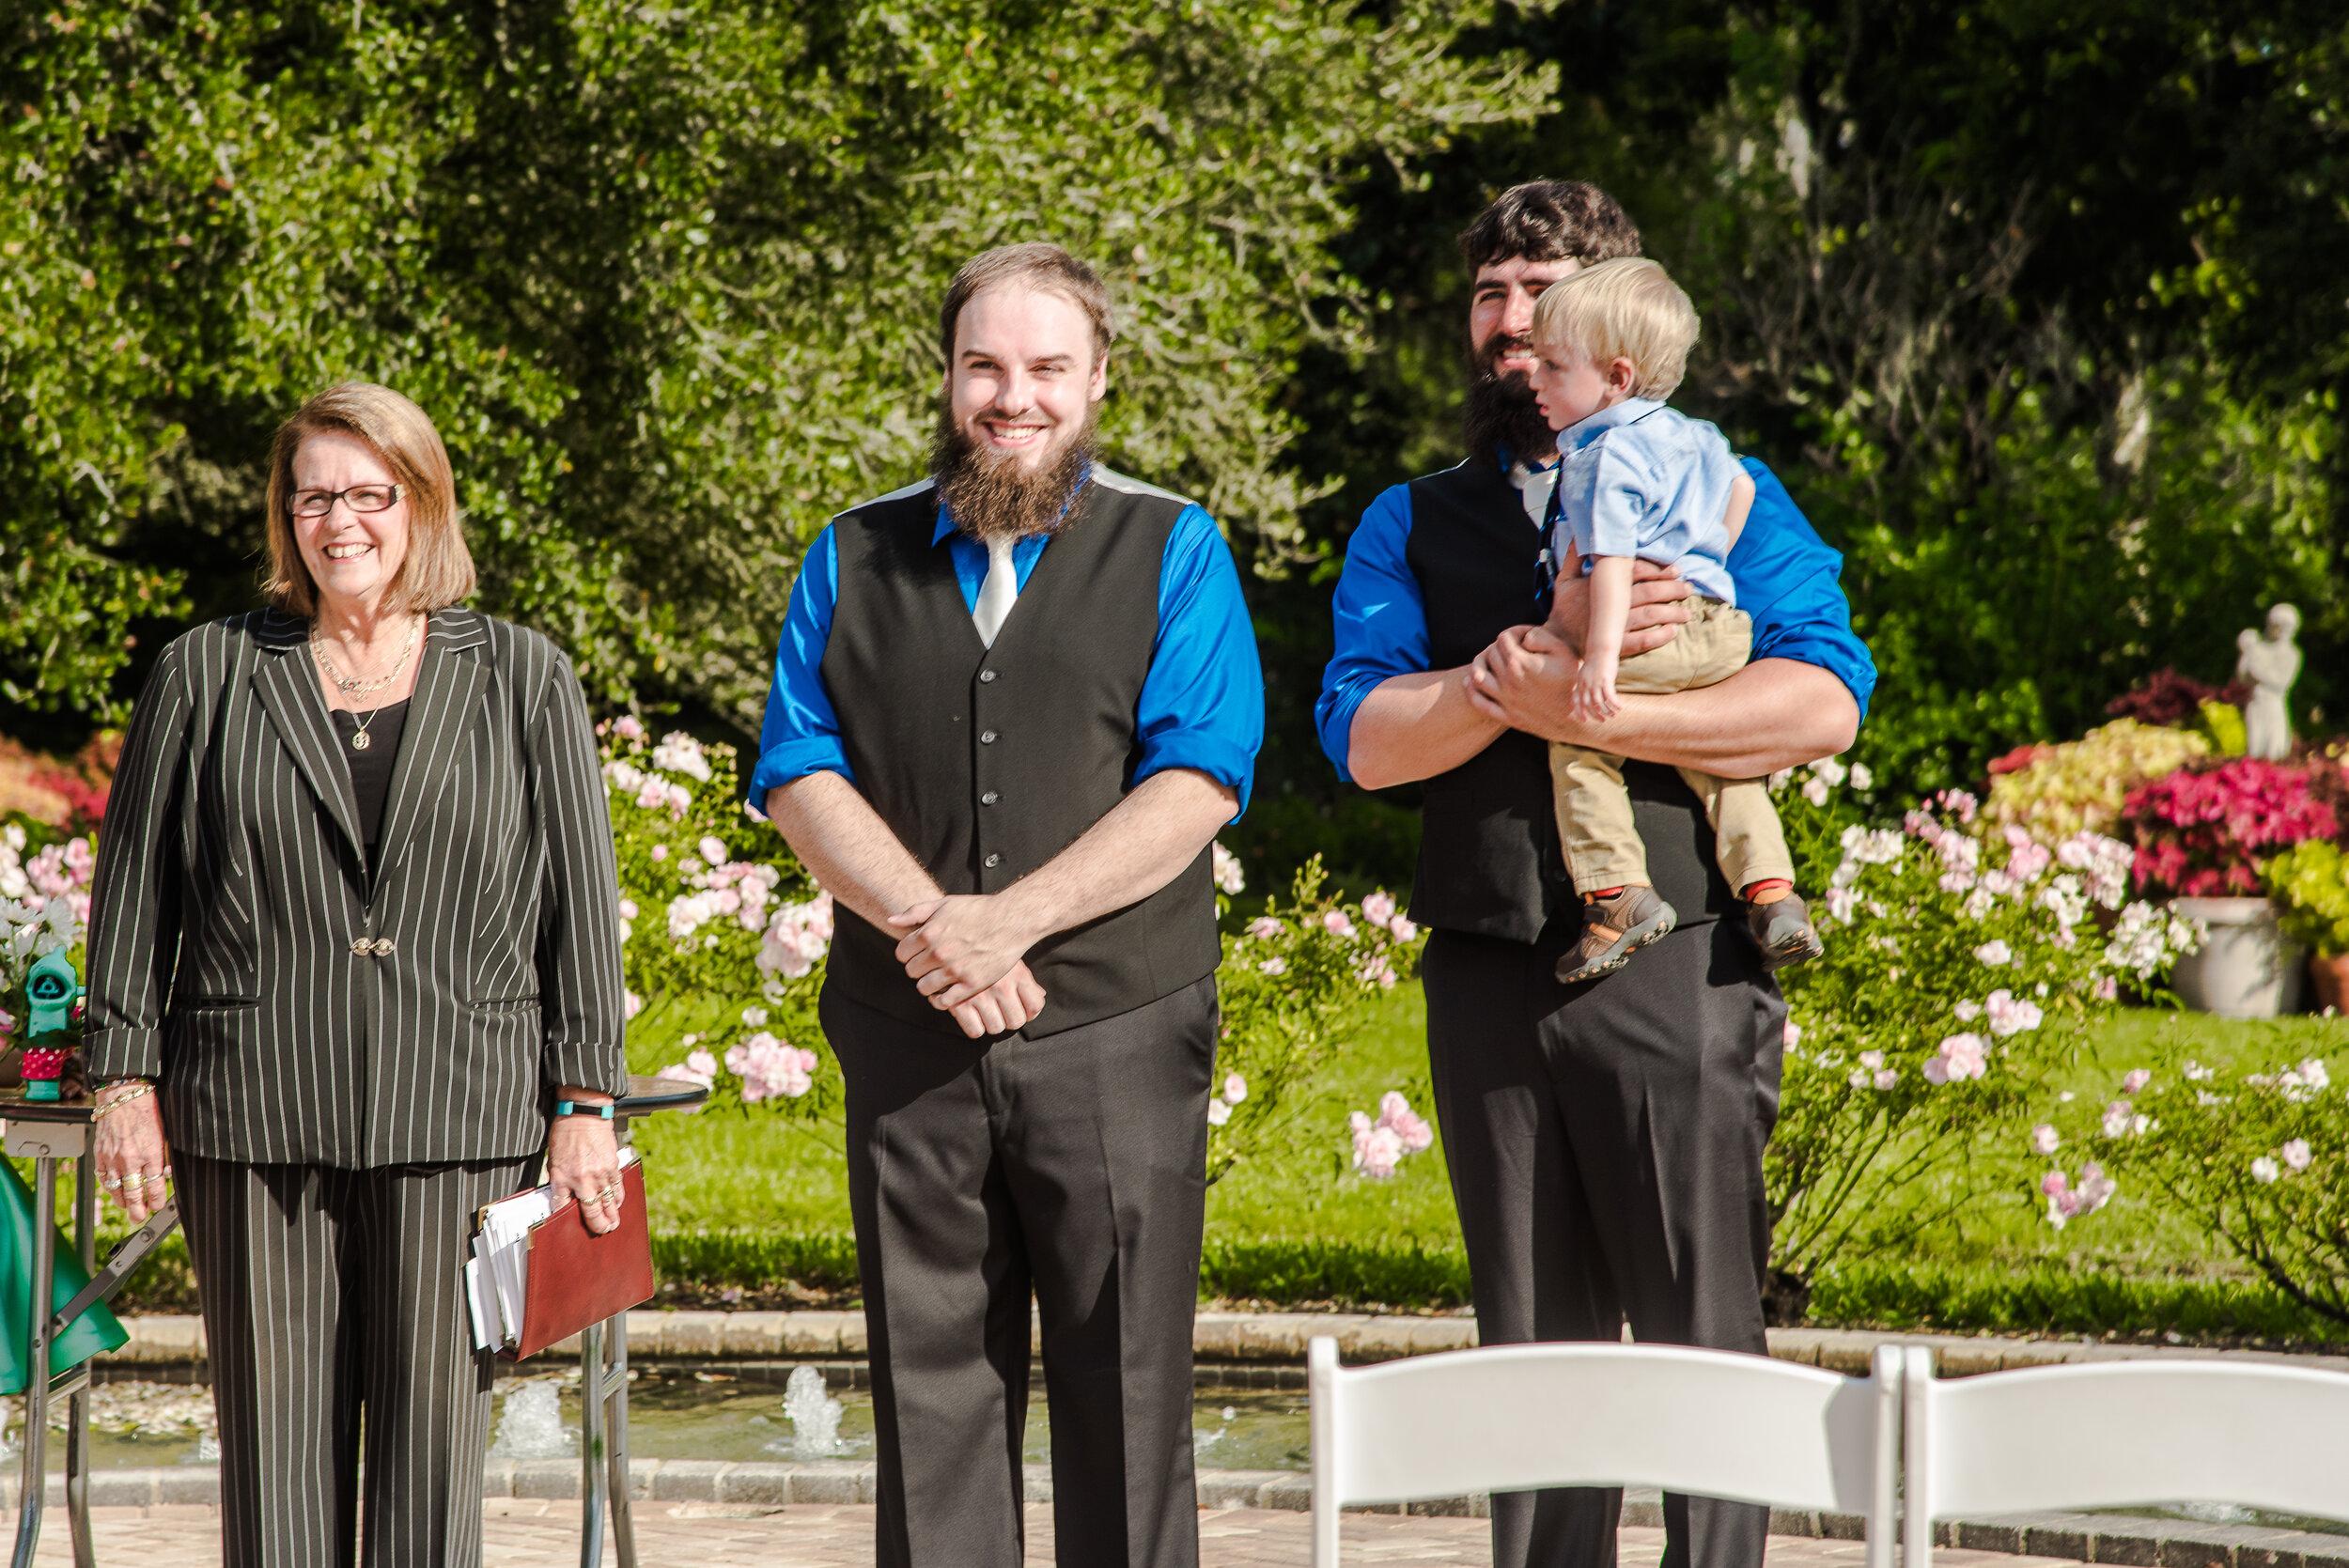 herry-garden-wedding-1-45.jpg